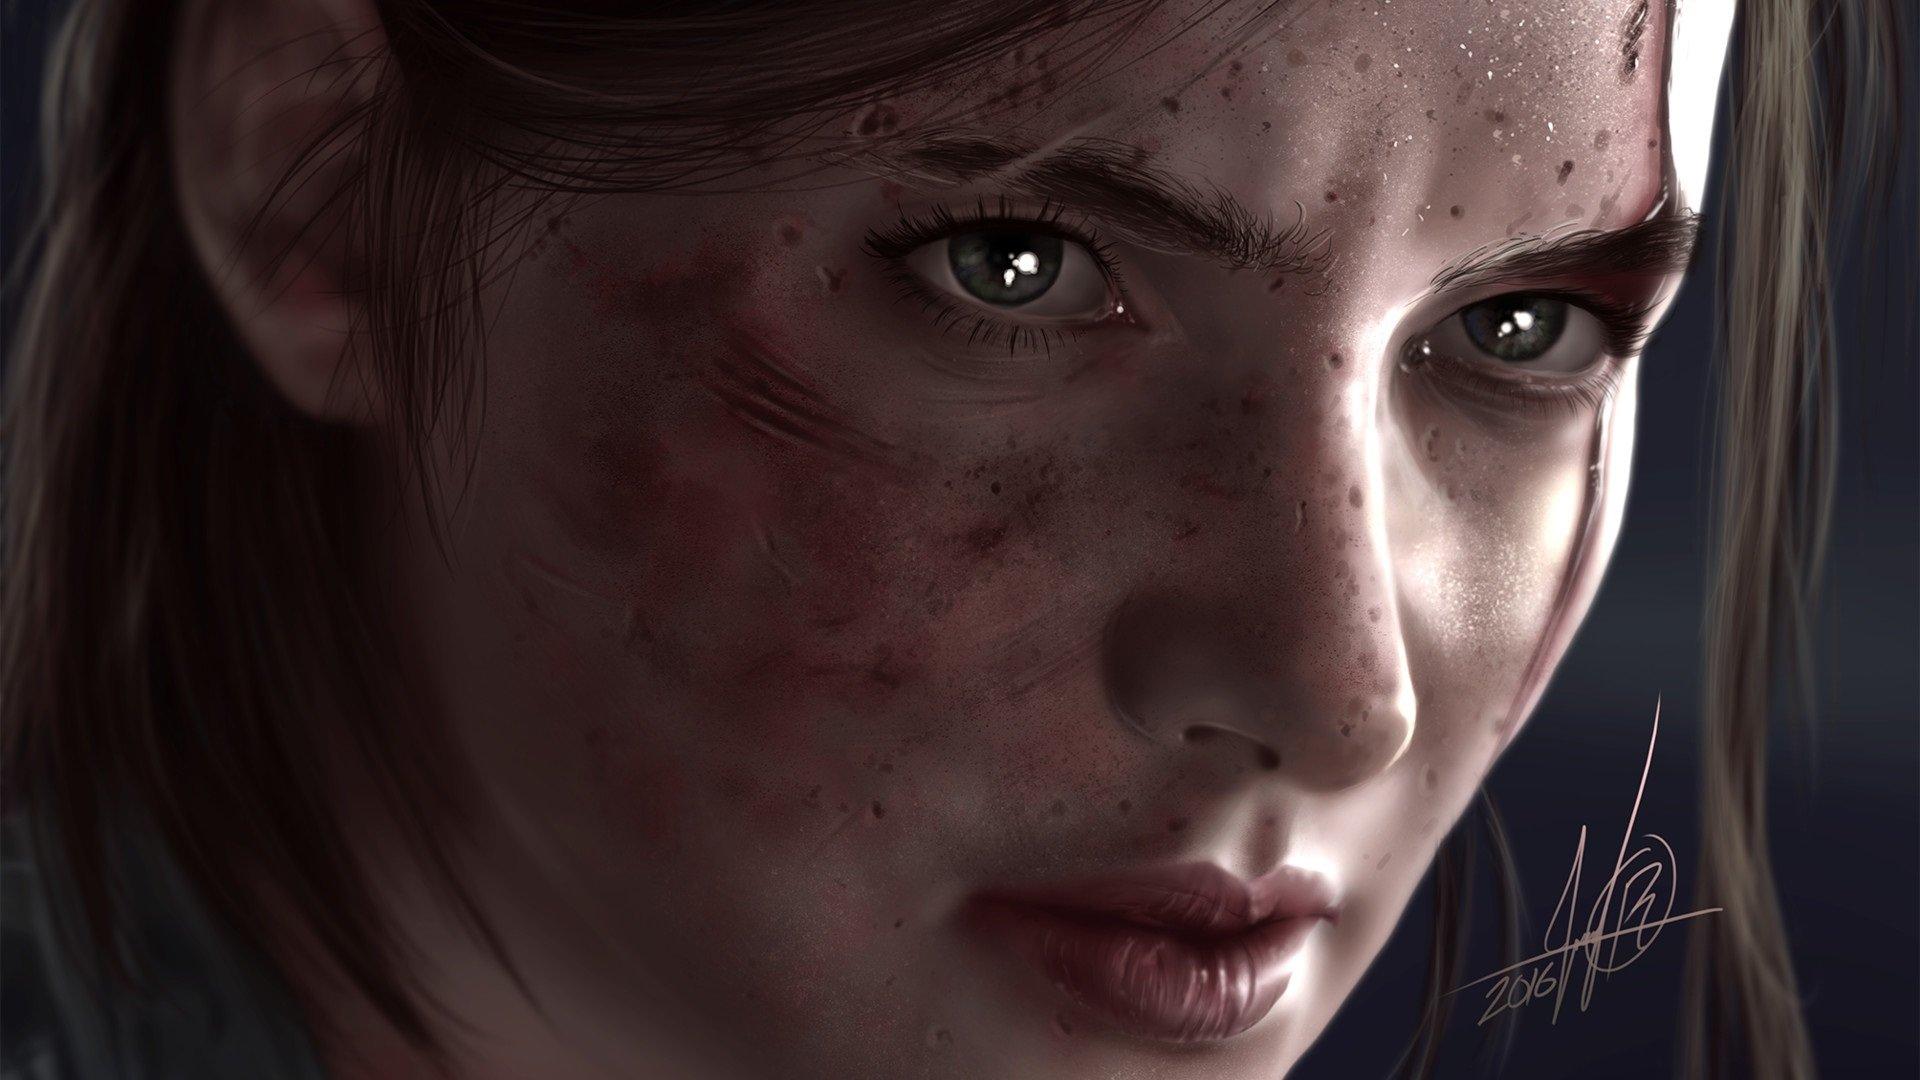 The Last Of Us Part 2 Wallpaper: The Last Of Us Part II HD Wallpaper